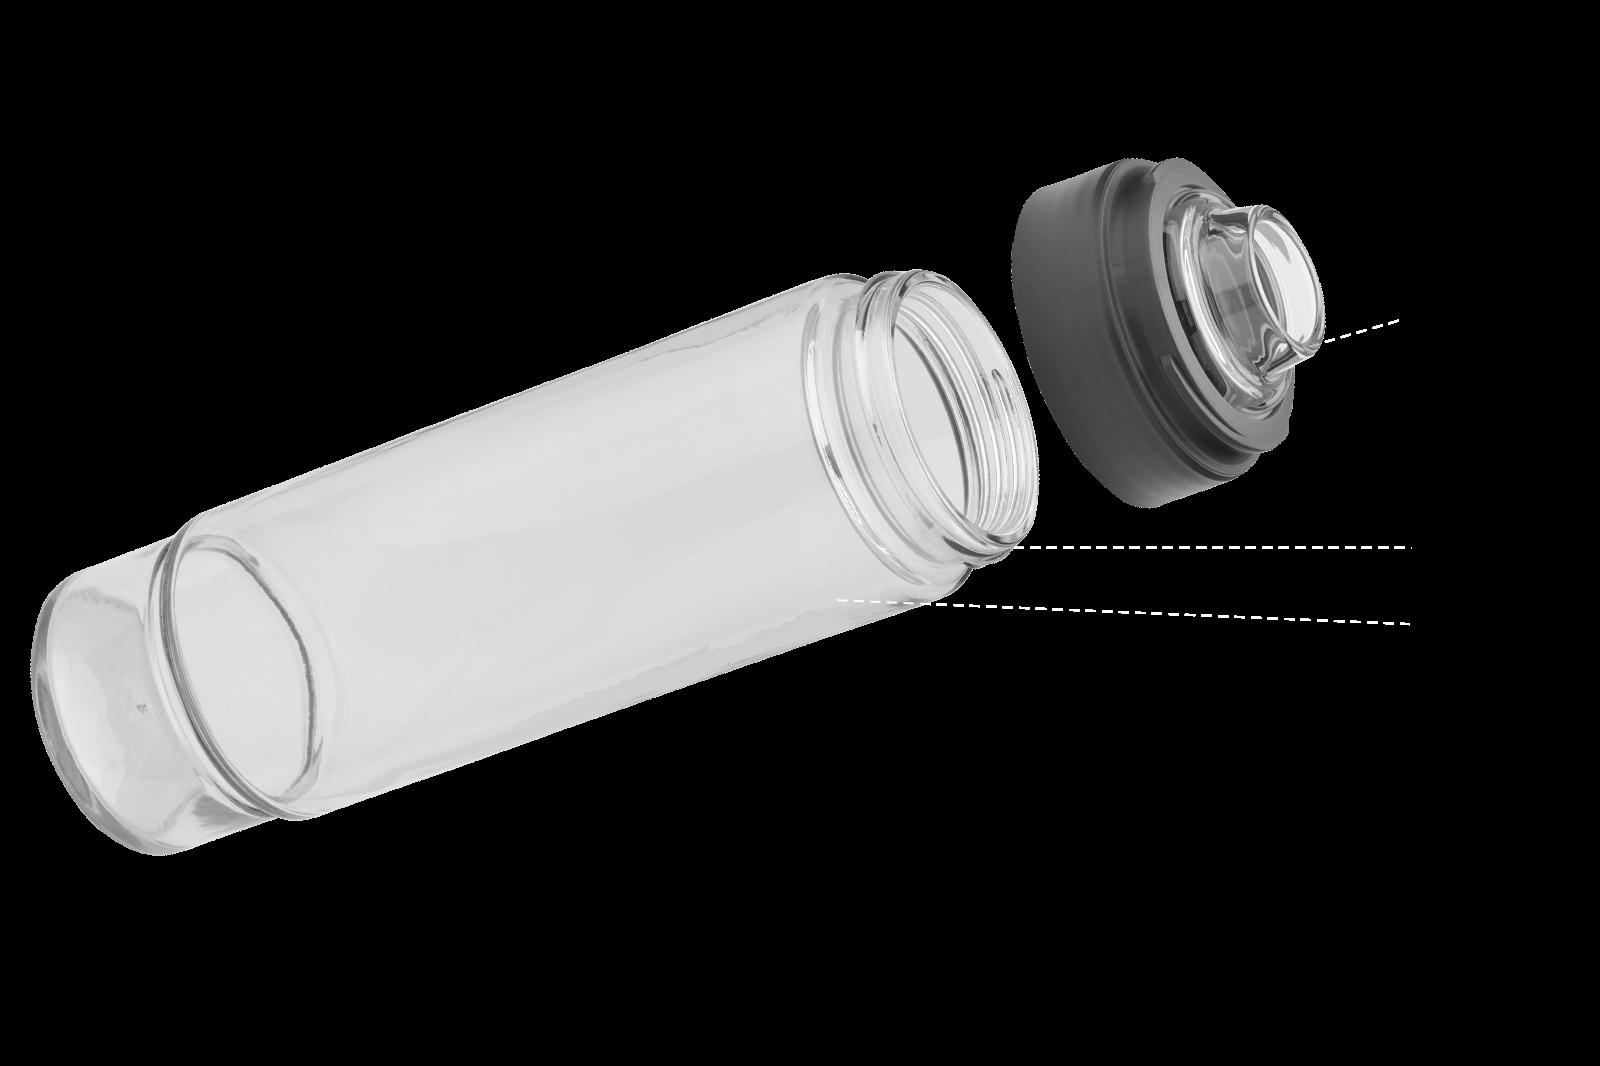 bottle closeup view